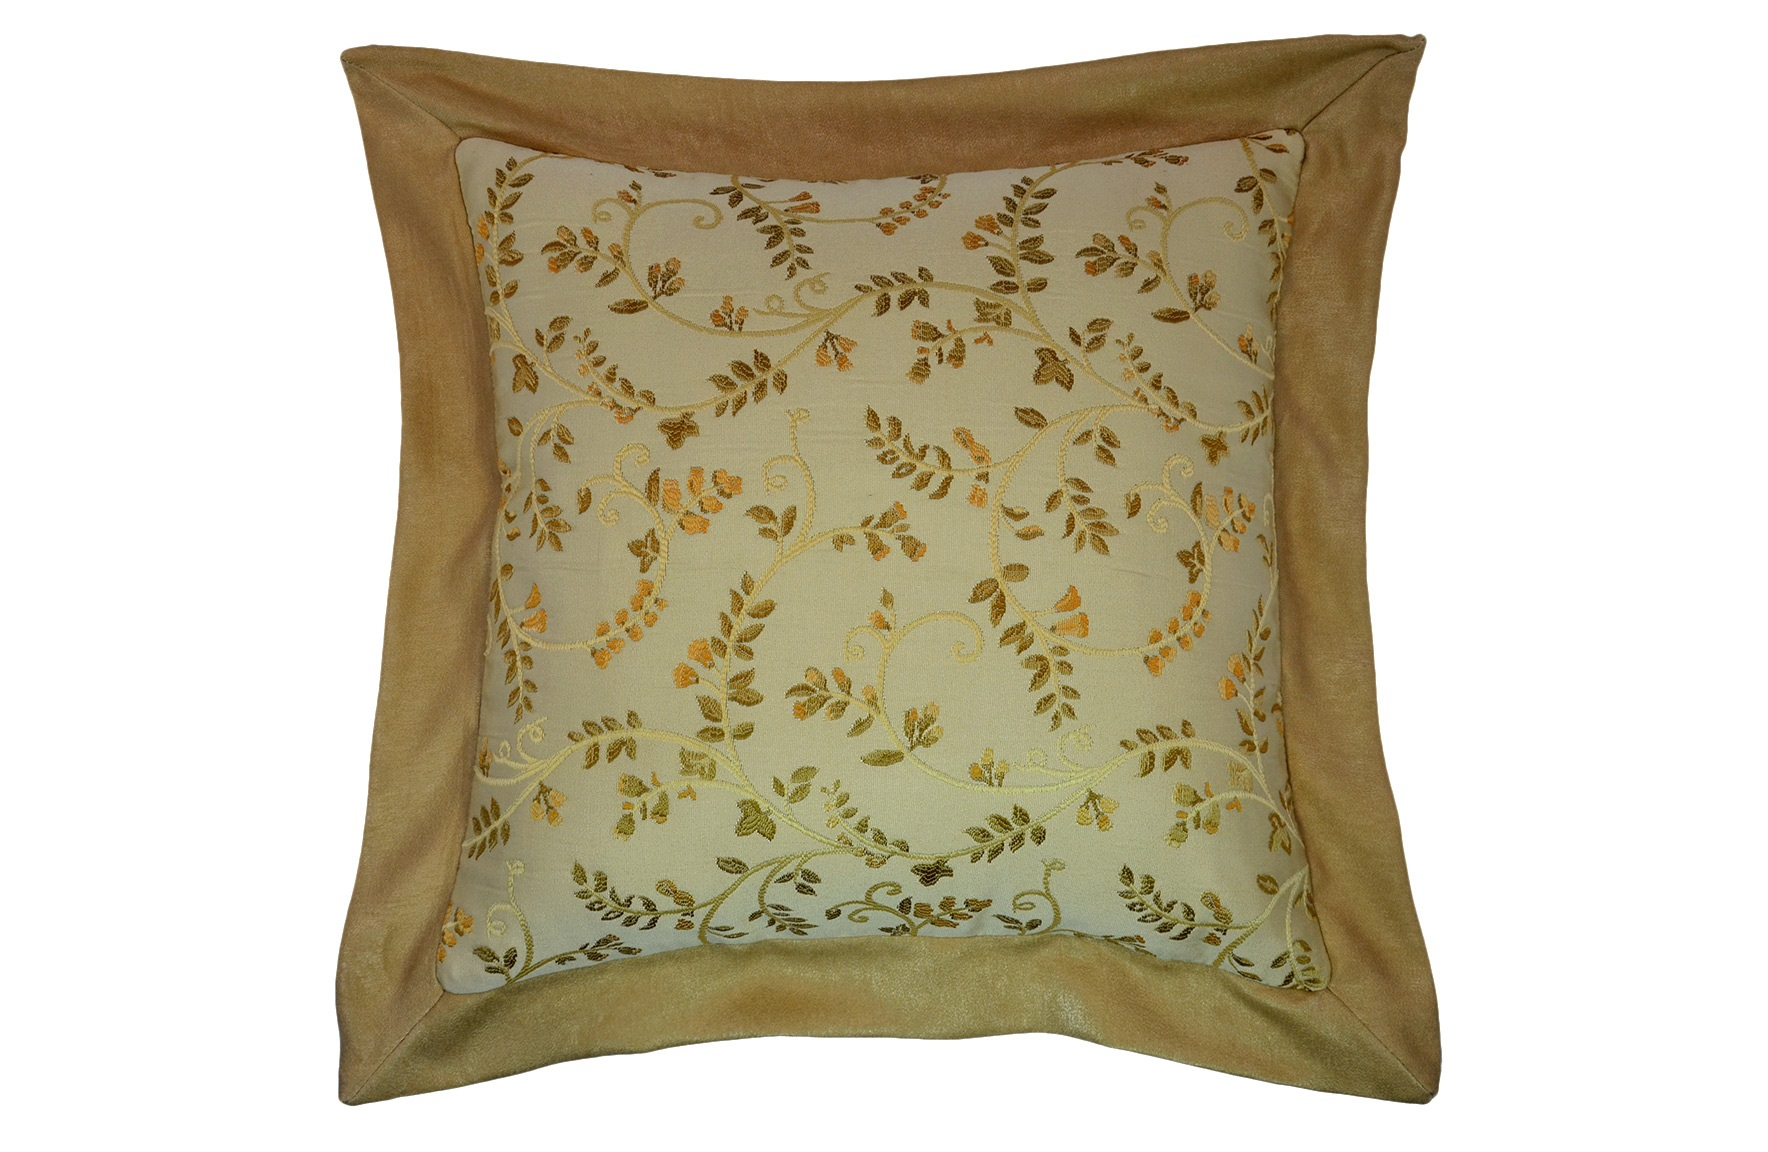 Подушка Arabelle CaramelКвадратные подушки<br>Декоративная  подушка .Чехол съемный.<br><br>Material: Вискоза<br>Length см: None<br>Width см: 50<br>Depth см: 15<br>Height см: 50